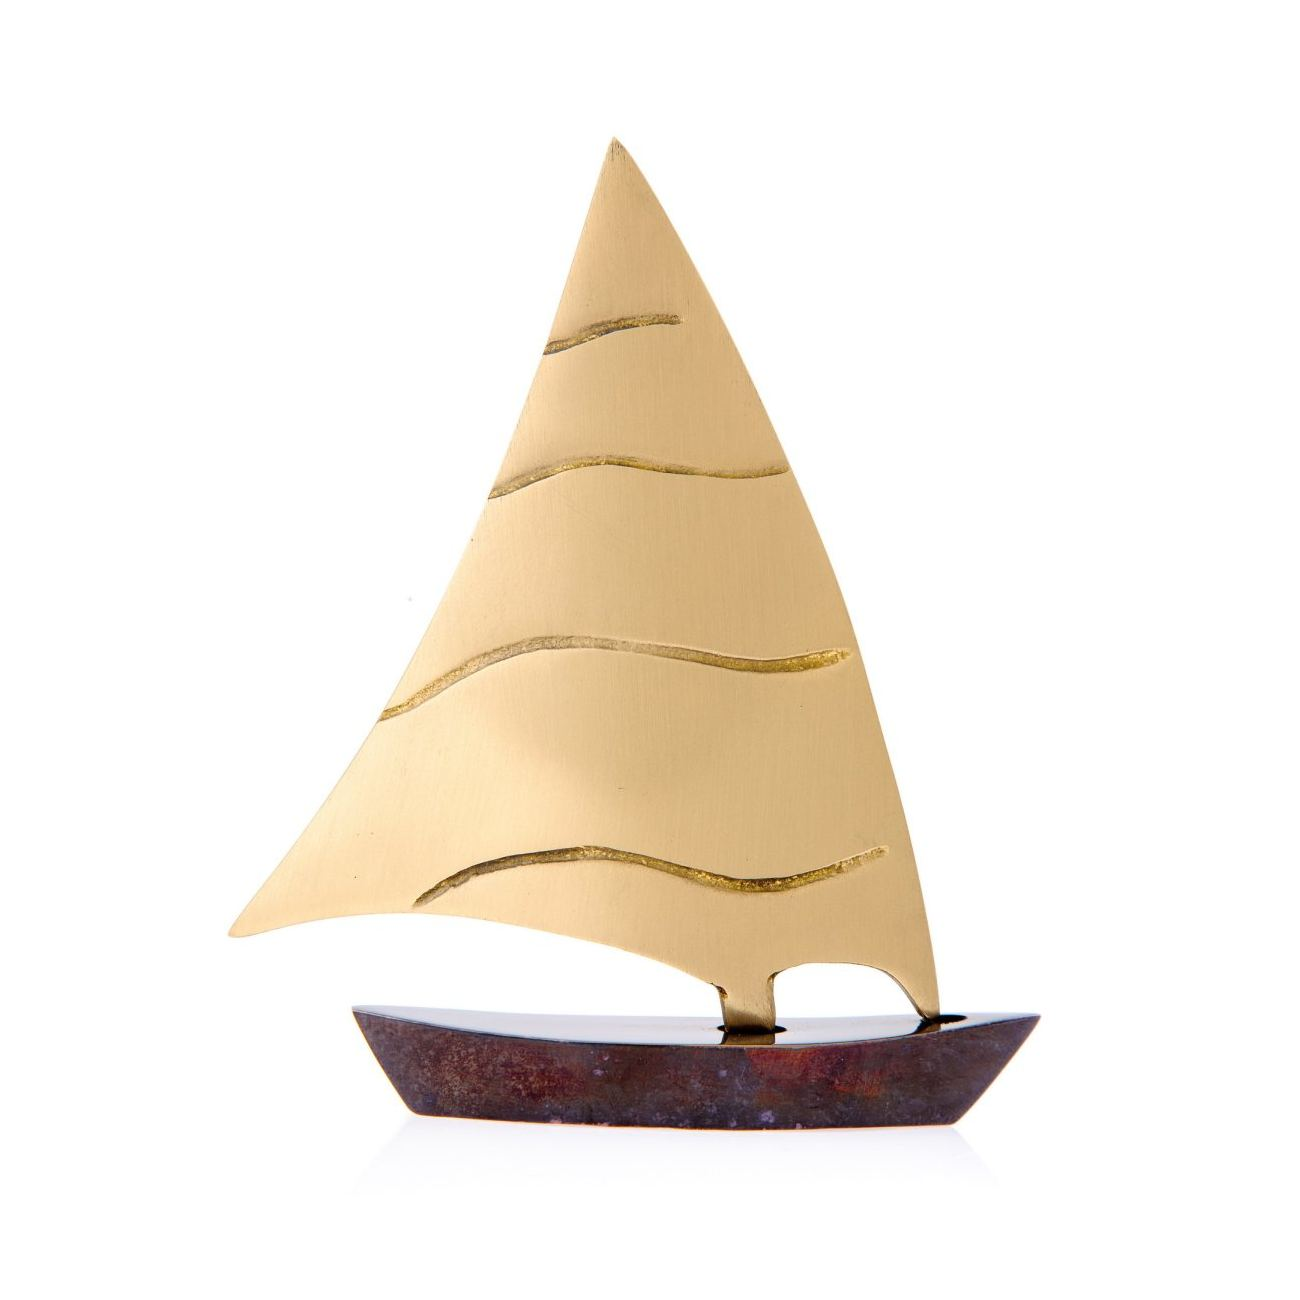 Sailing Boat Set Of 3 Handmade Metal Decorative Nautical Ornament Oxidized Bronze Small Medium Large